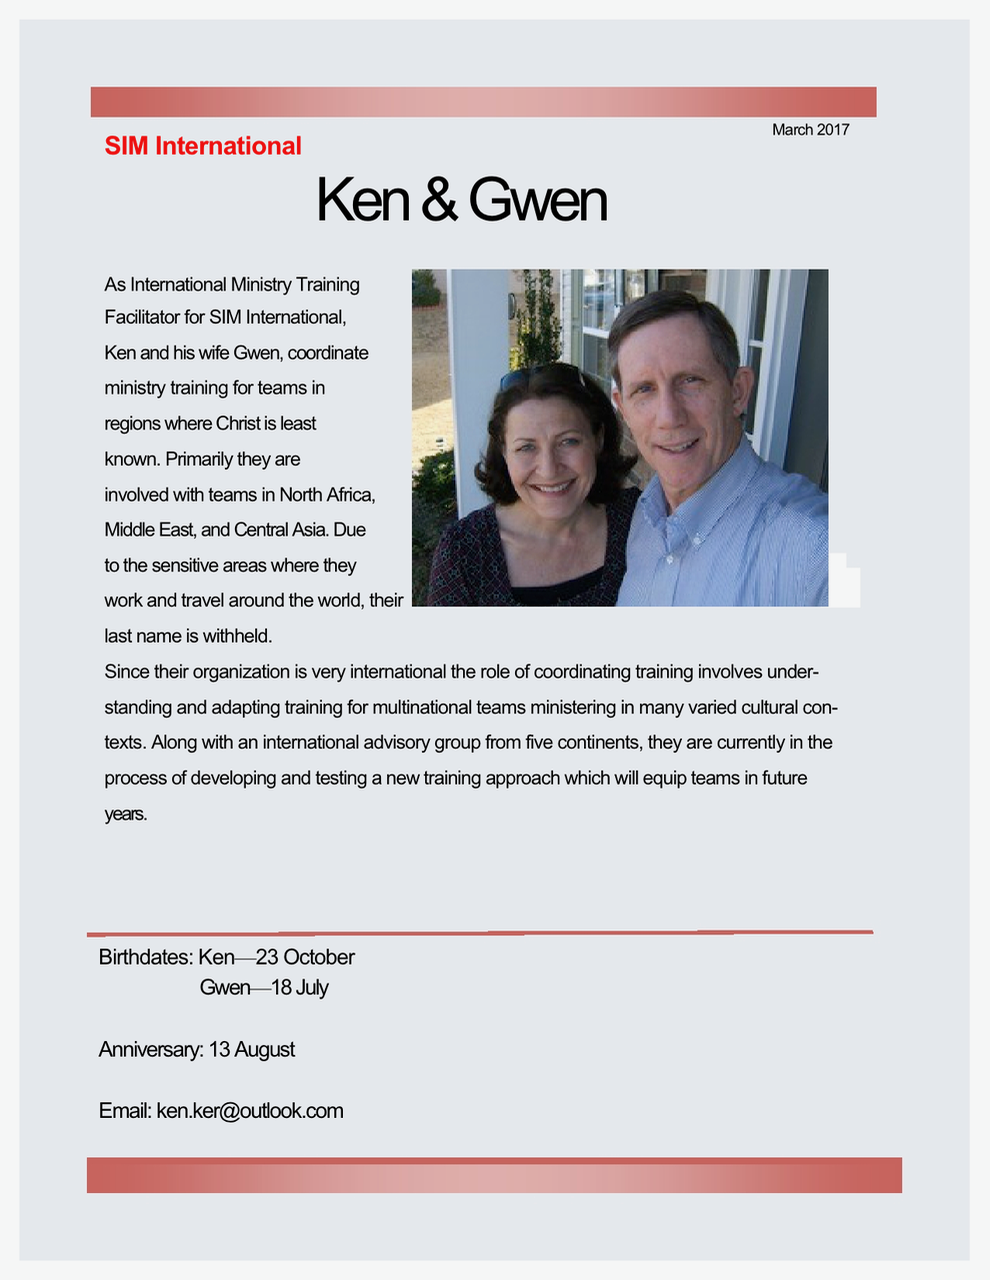 Ken and Gwen